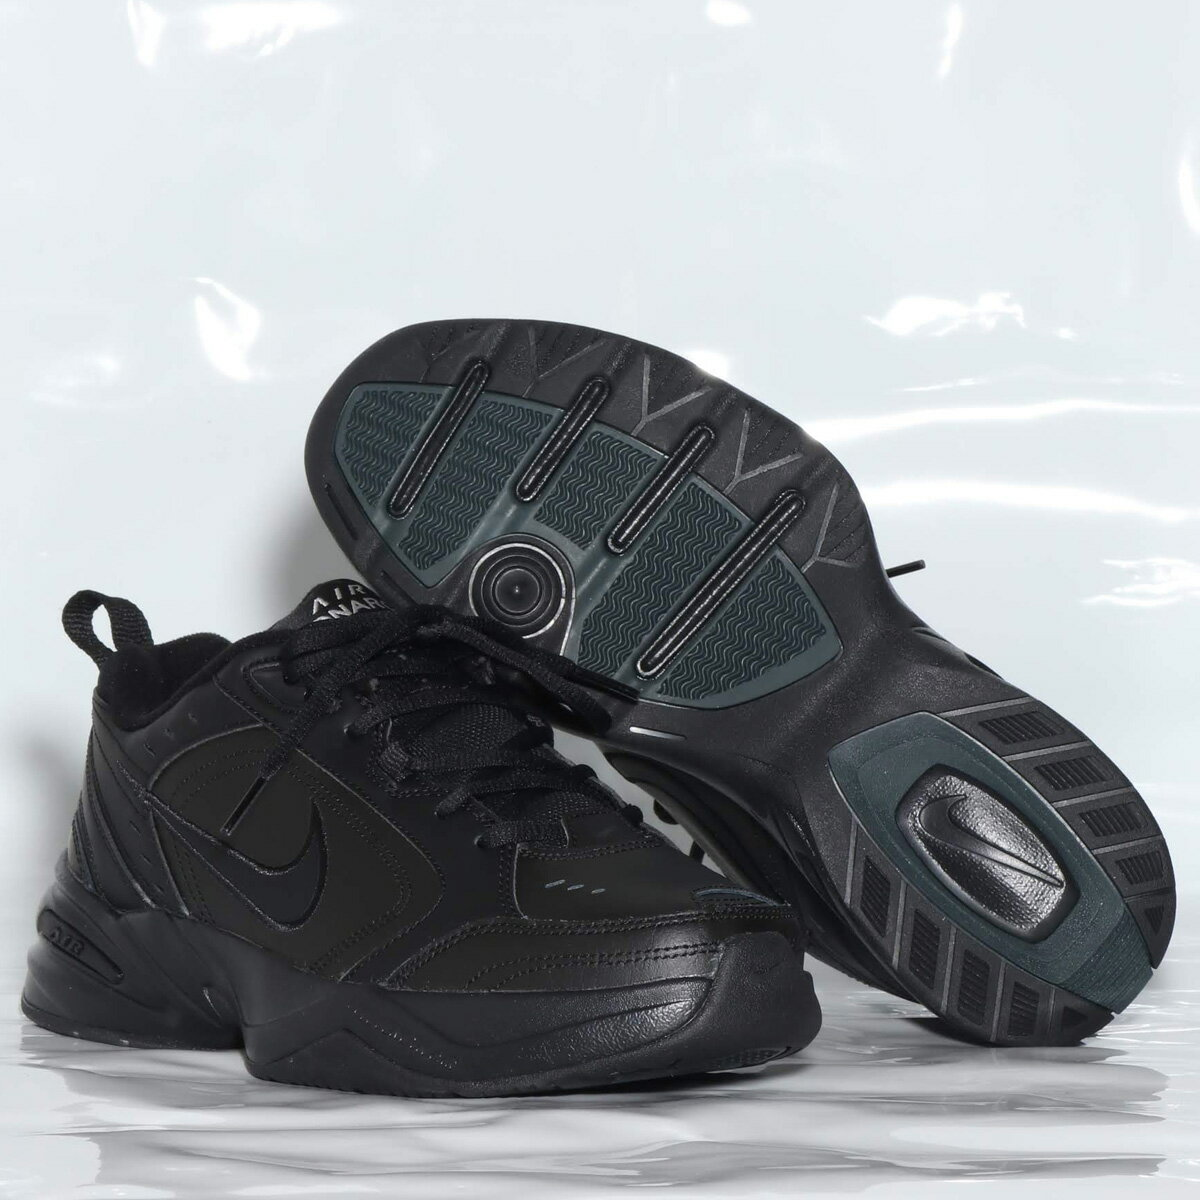 NIKE AIR MONARCH IV(ナイキ エア モナーク 4)BLACK/BLACK【メンズ レディース スニーカー】18HO-I